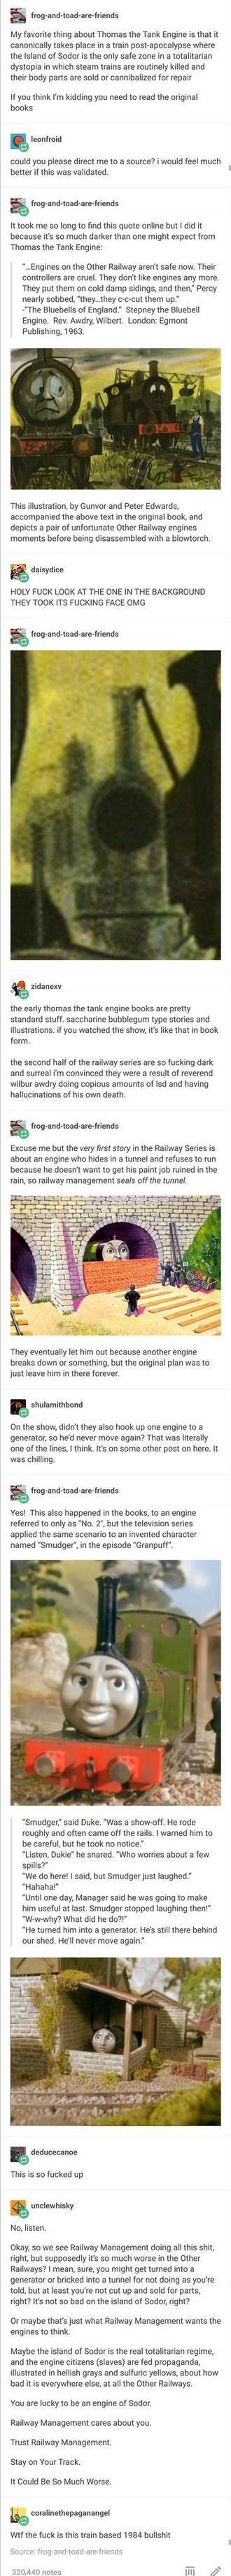 Thomas the Tank Engine Dystopian Discourse